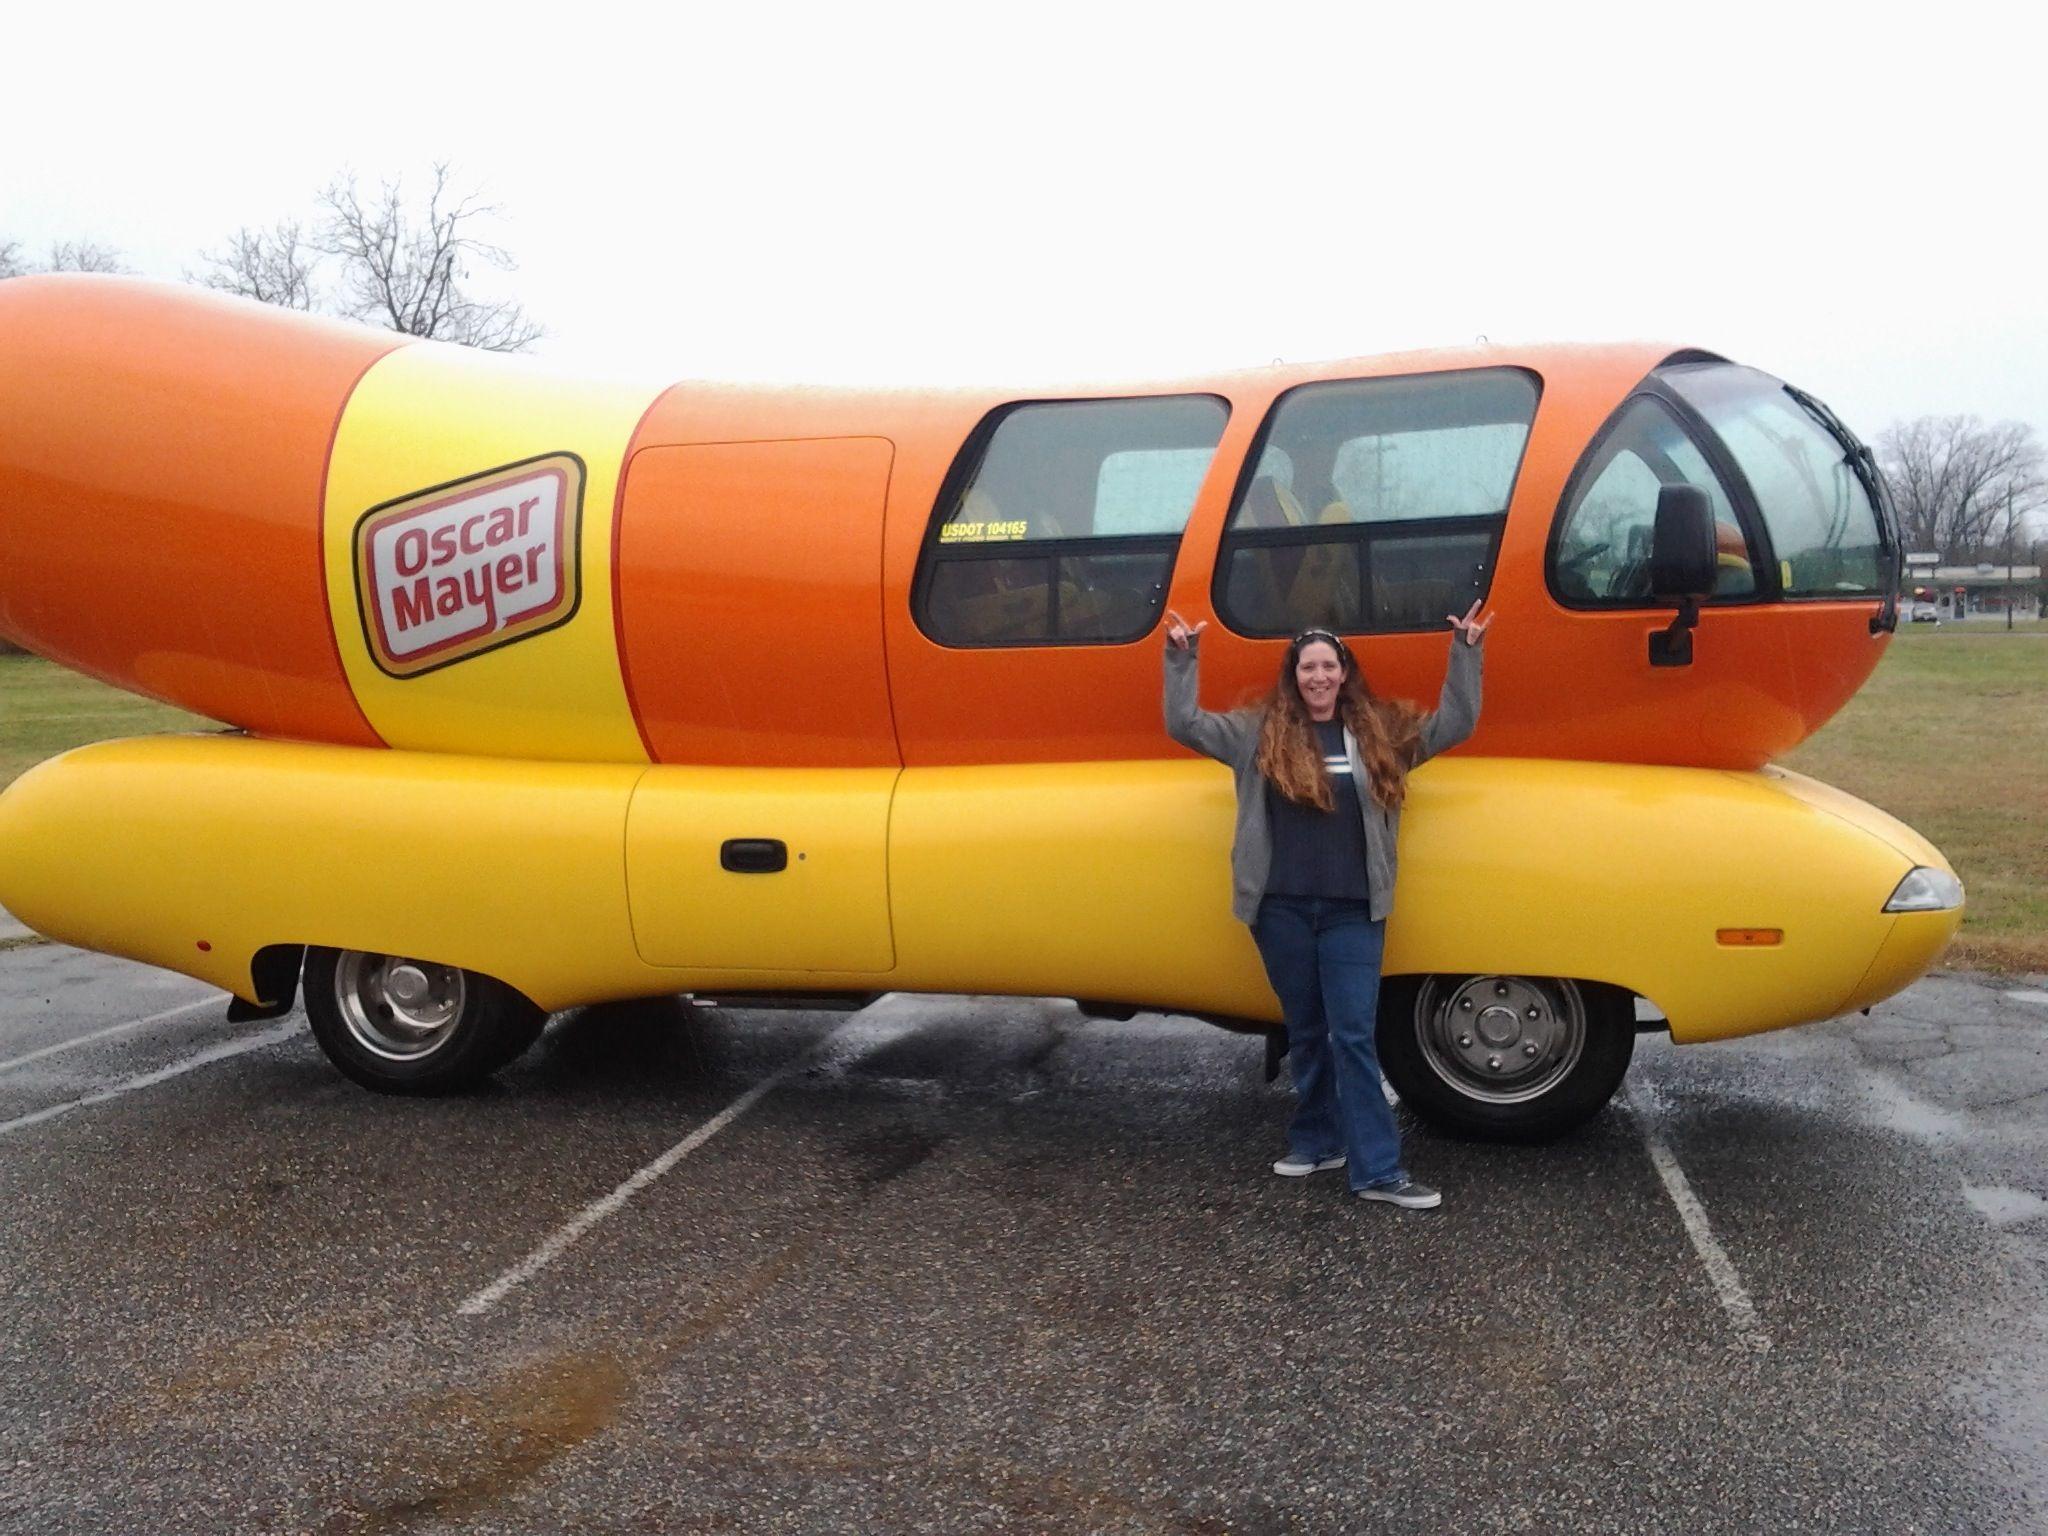 Oscar Mayer Wienermobile At University Of Oregon Editorial Image ...